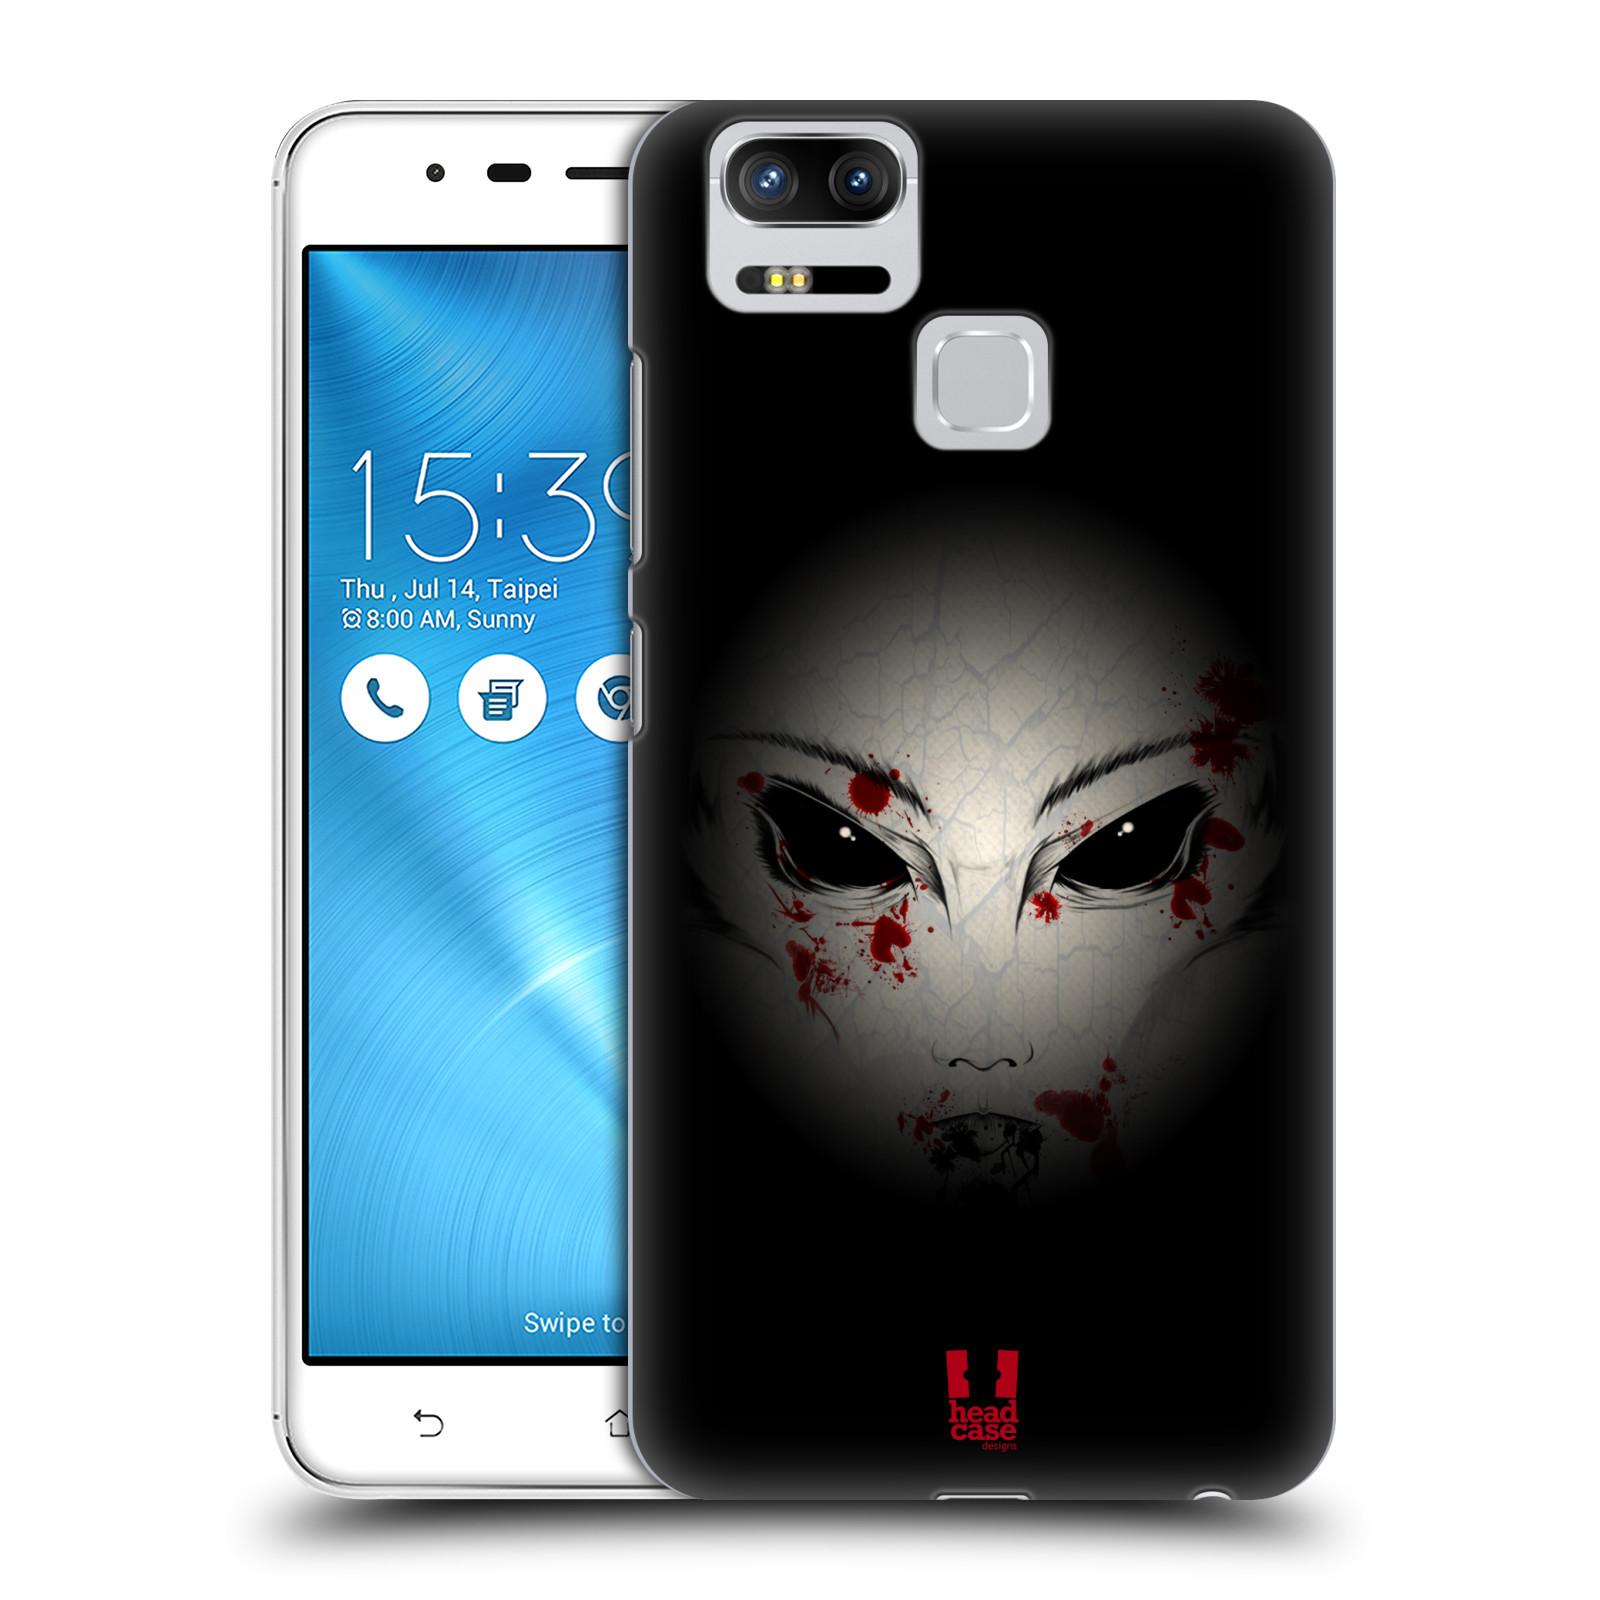 Plastové pouzdro na mobil Asus ZenFone 3 ZOOM ZE553KL - Head Case - Macabre (Plastový kryt či obal na mobilní telefon Asus ZenFone 3 ZOOM ZE553KL s motivem Macabre)